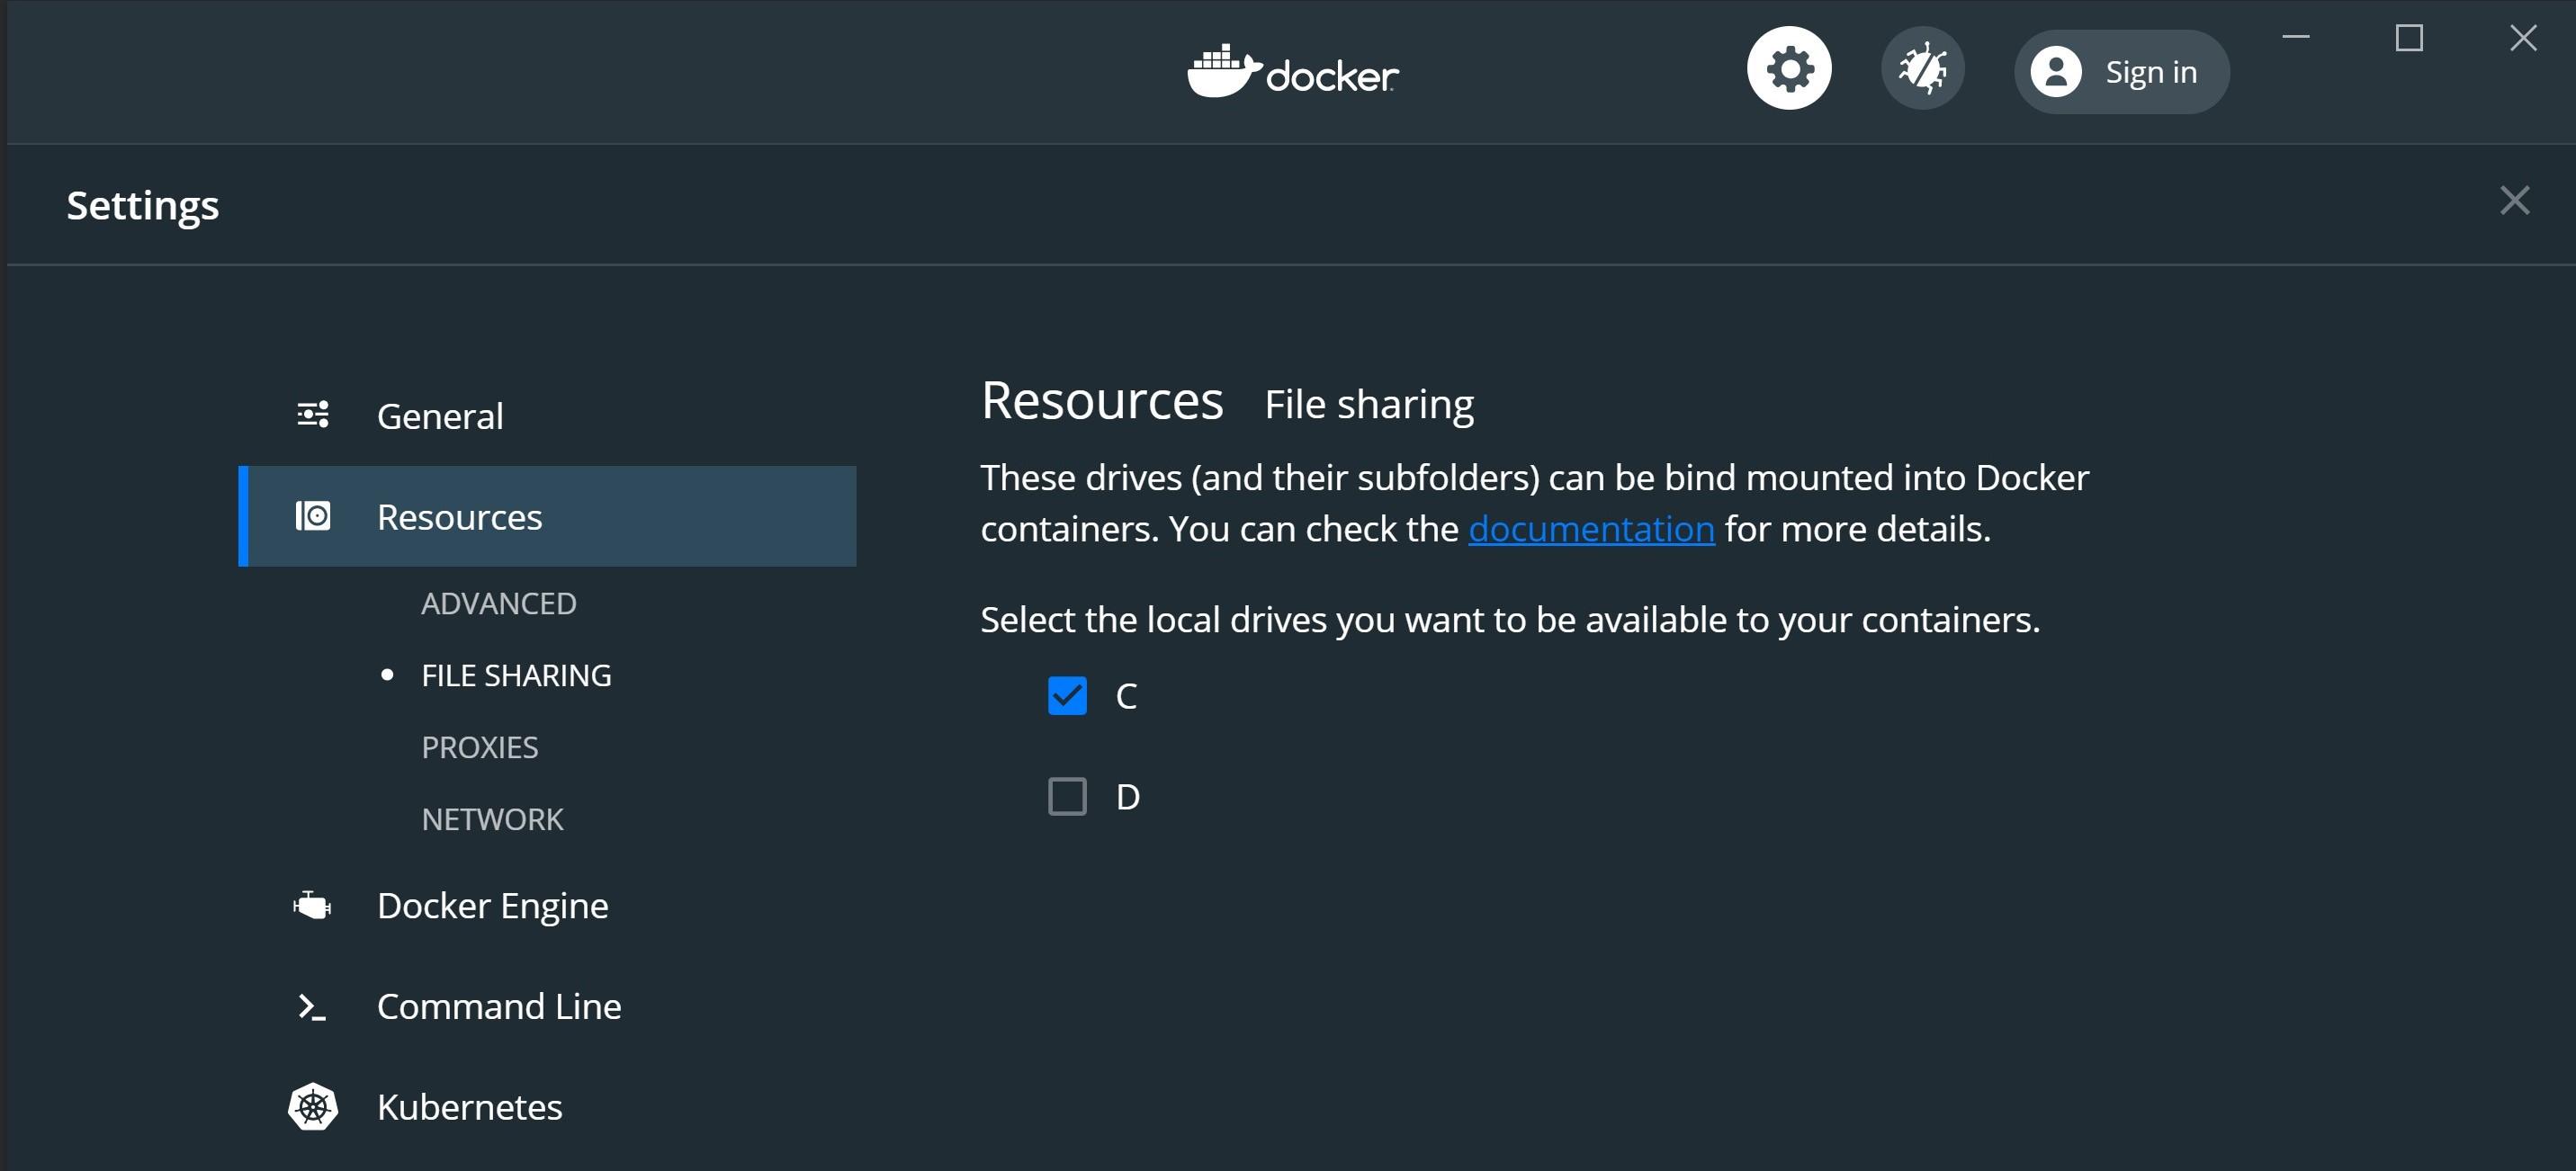 Docker file sharing settings screenshot